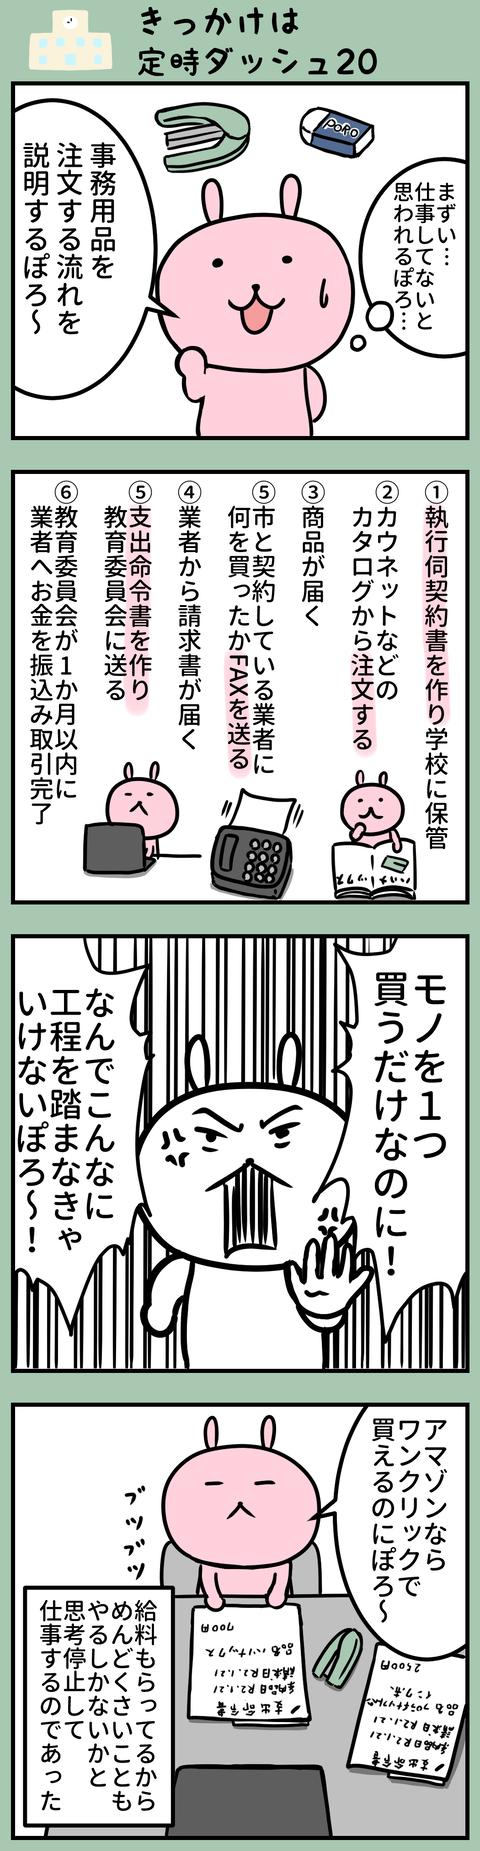 manga-yuzuporo76-1